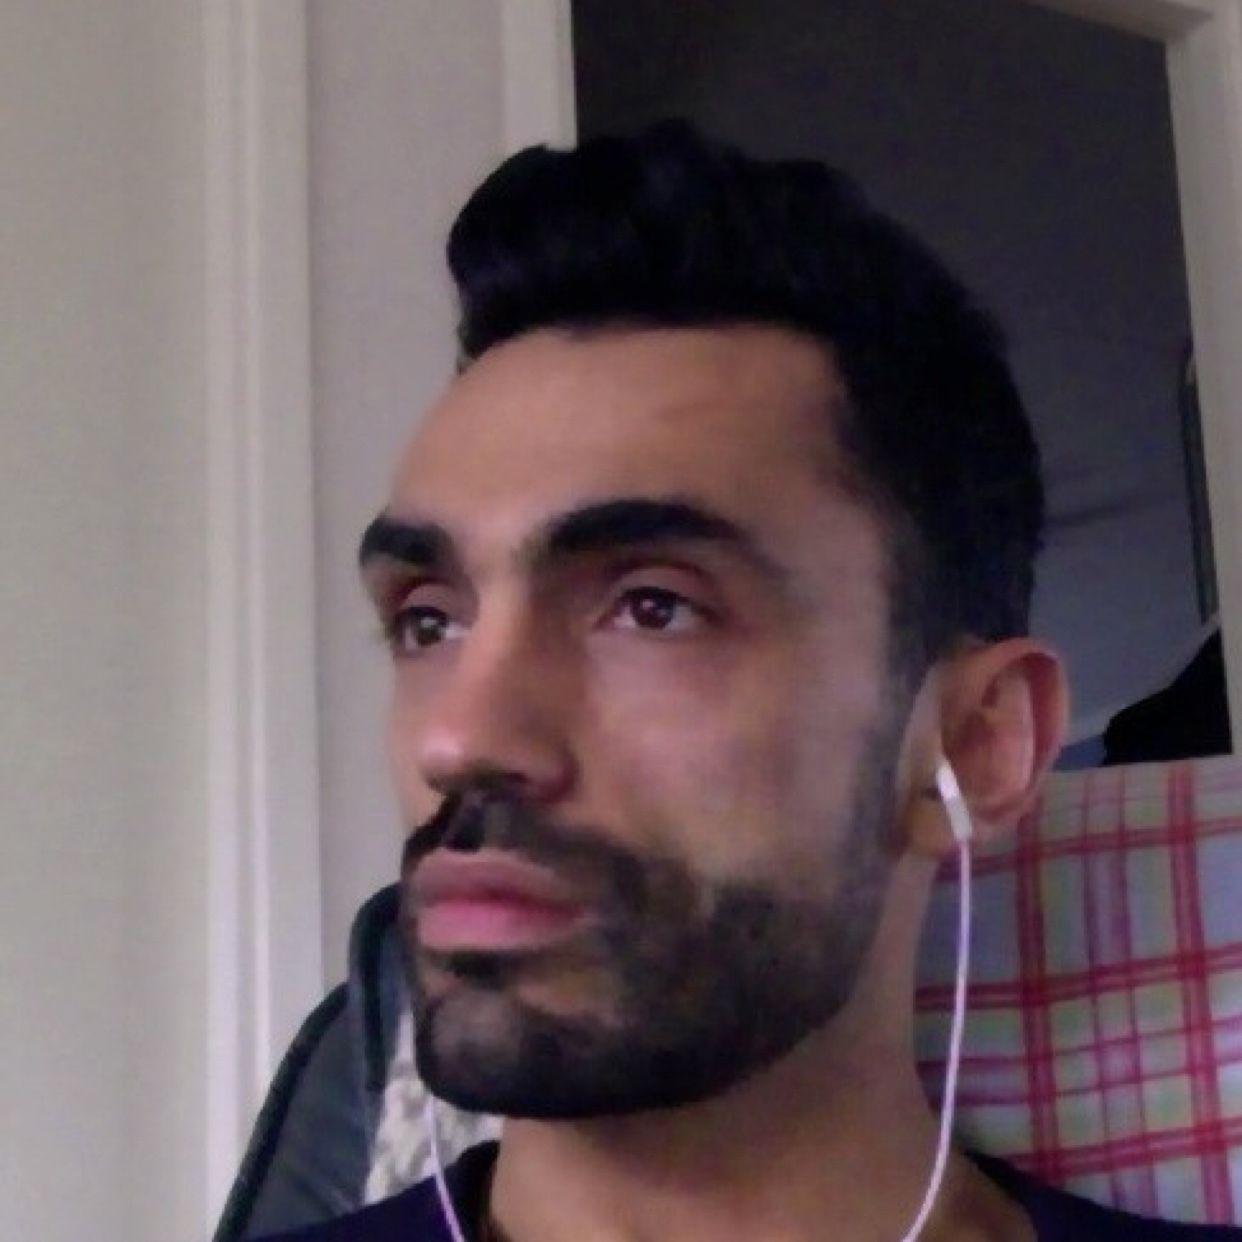 Gay Men groups in London Meetup